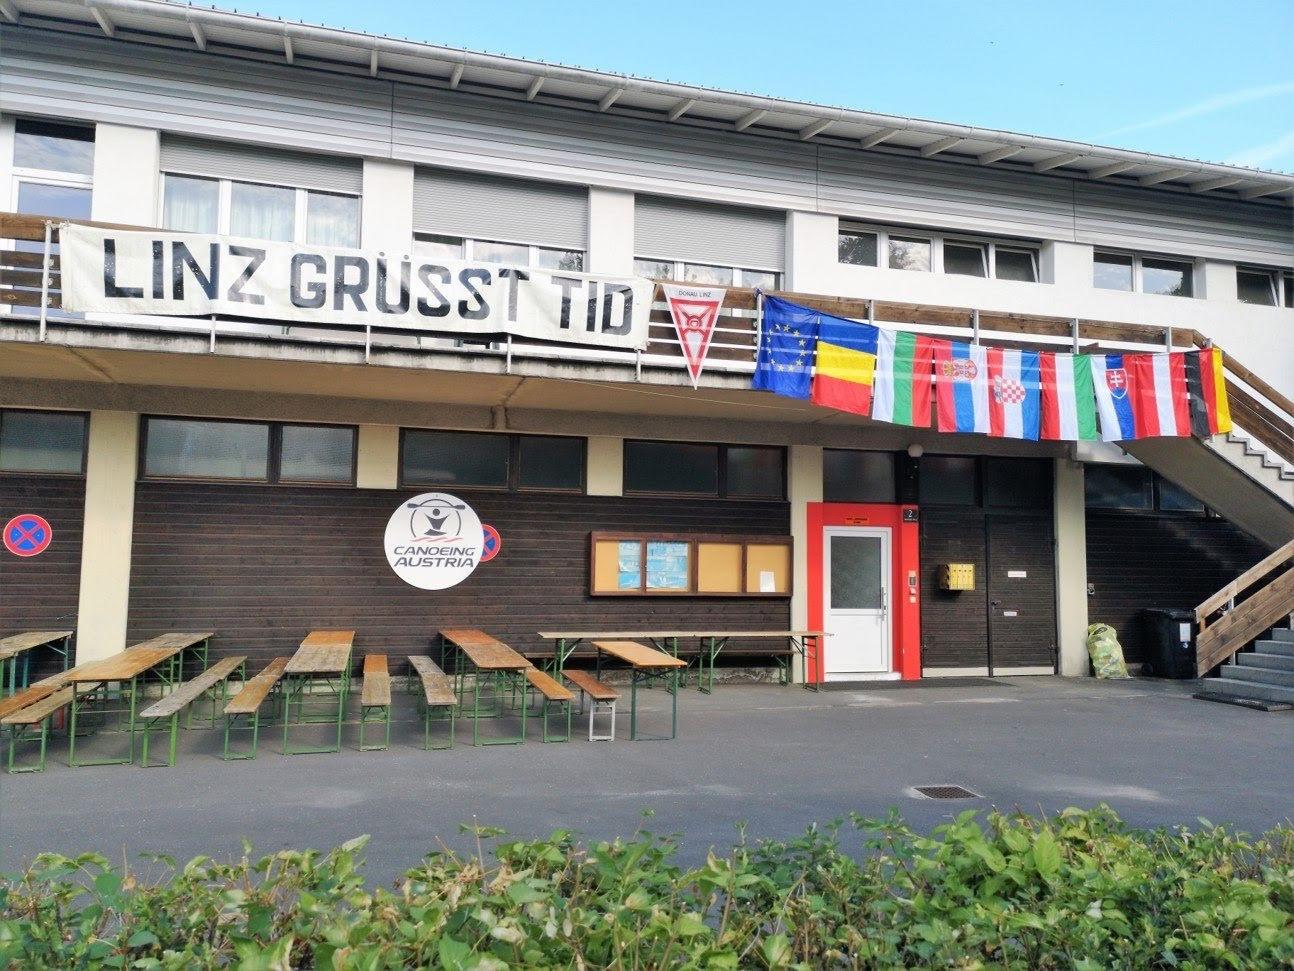 Linz grüßt die TID